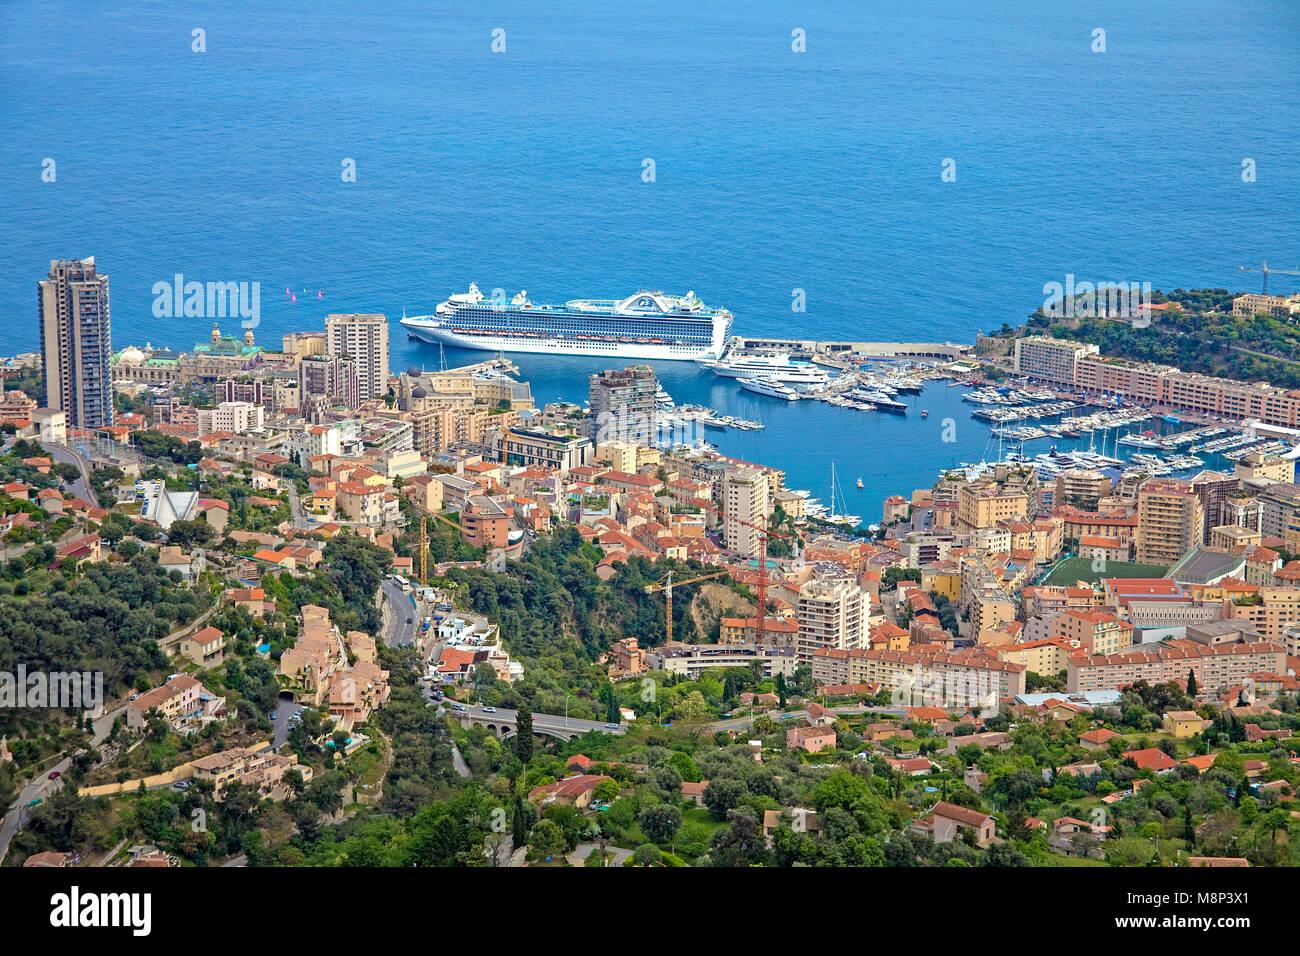 Kreuzfahrtschiff im Hafen von Monaco, Fuerstentum Monaco, Europa | Cruise liner at harbour of Monaco, Principality - Stock Image